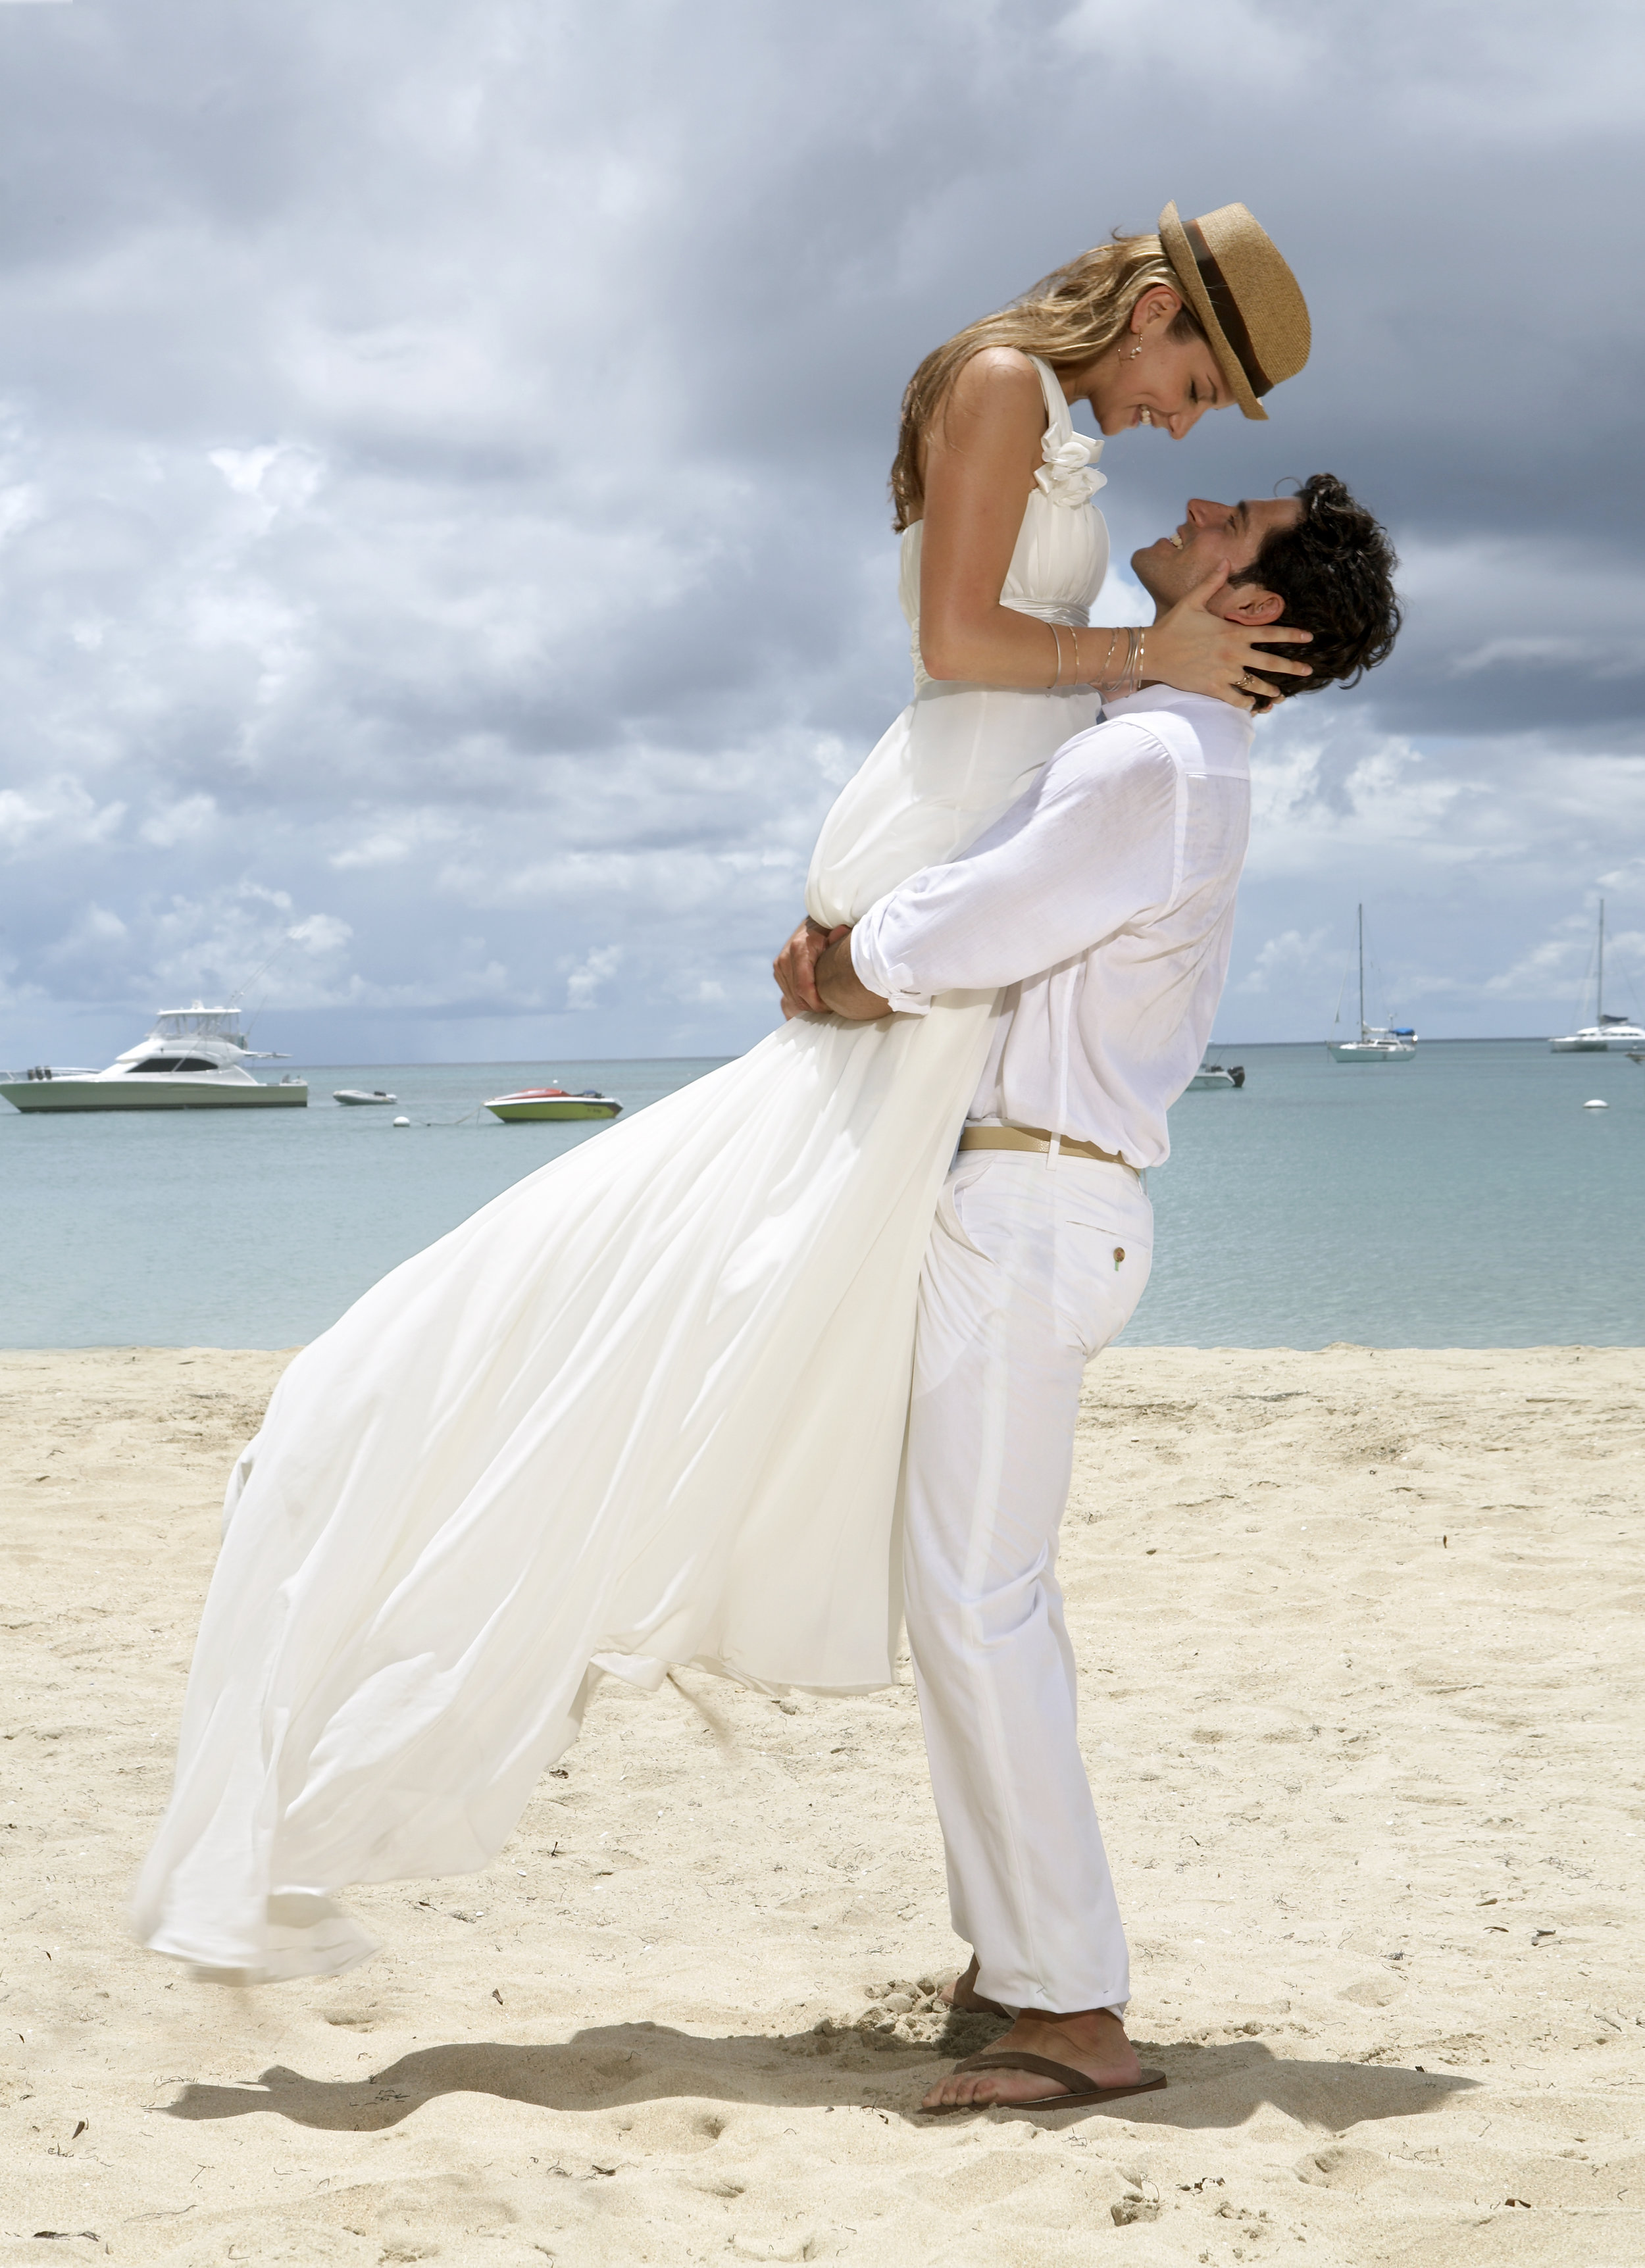 St. Croix Lovers